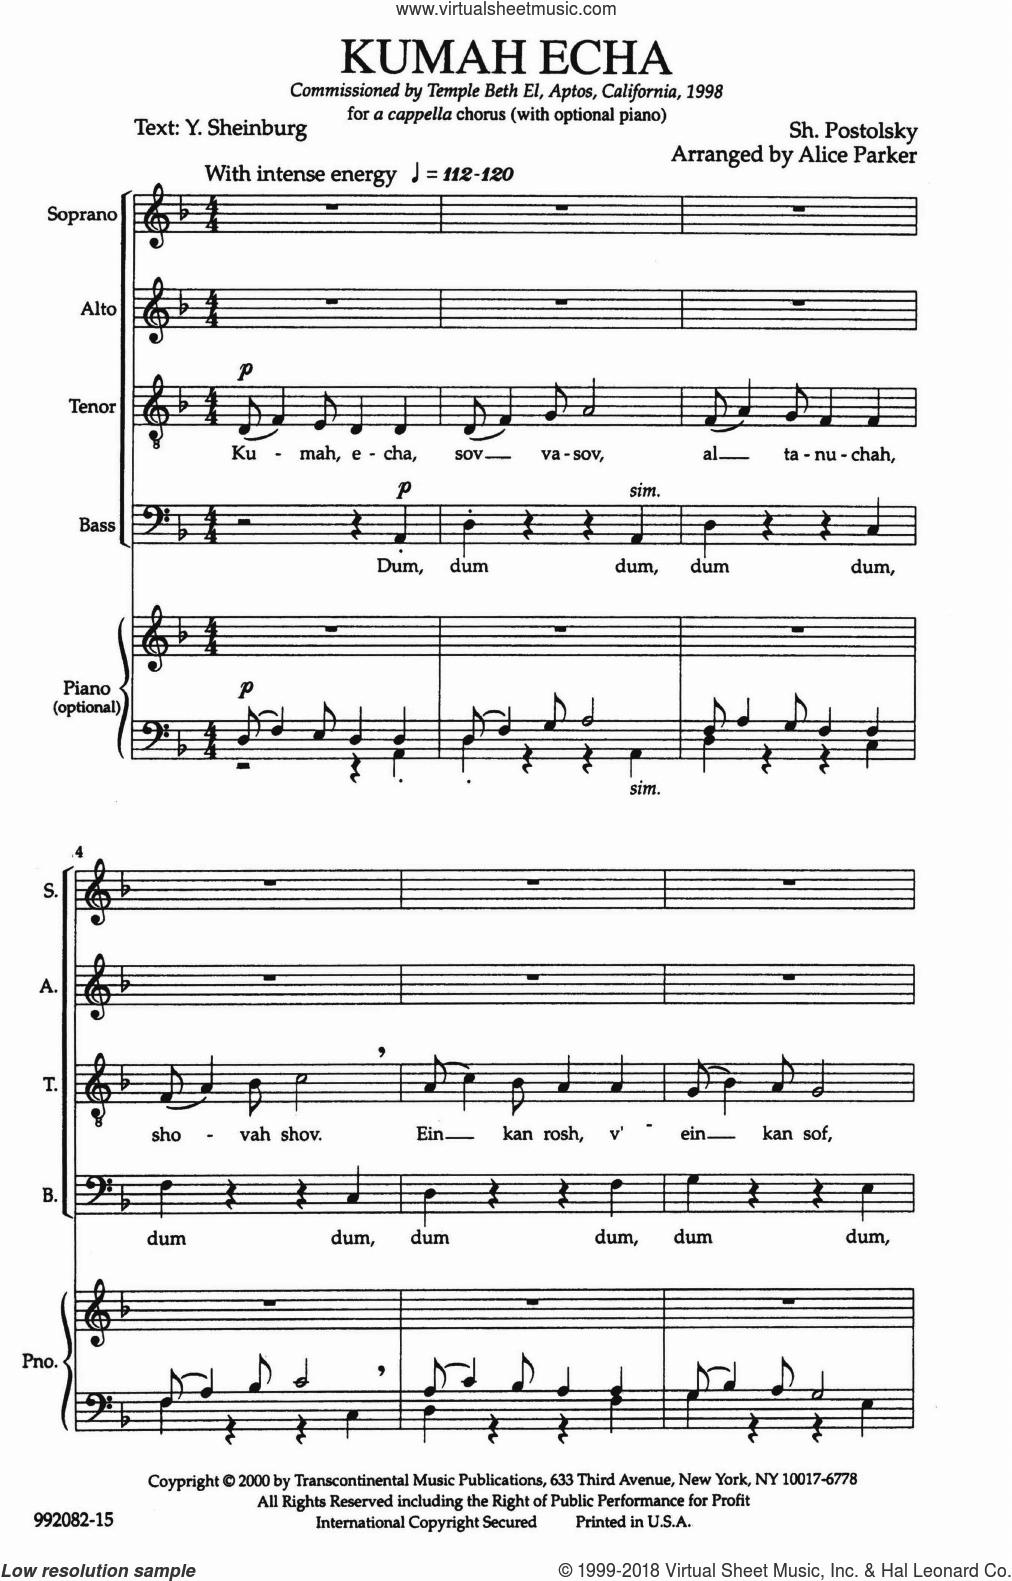 Kumah Echa (Rise Up) sheet music for choir (SATB: soprano, alto, tenor, bass) by Alice Parker and Shlomo Postolsky, intermediate skill level